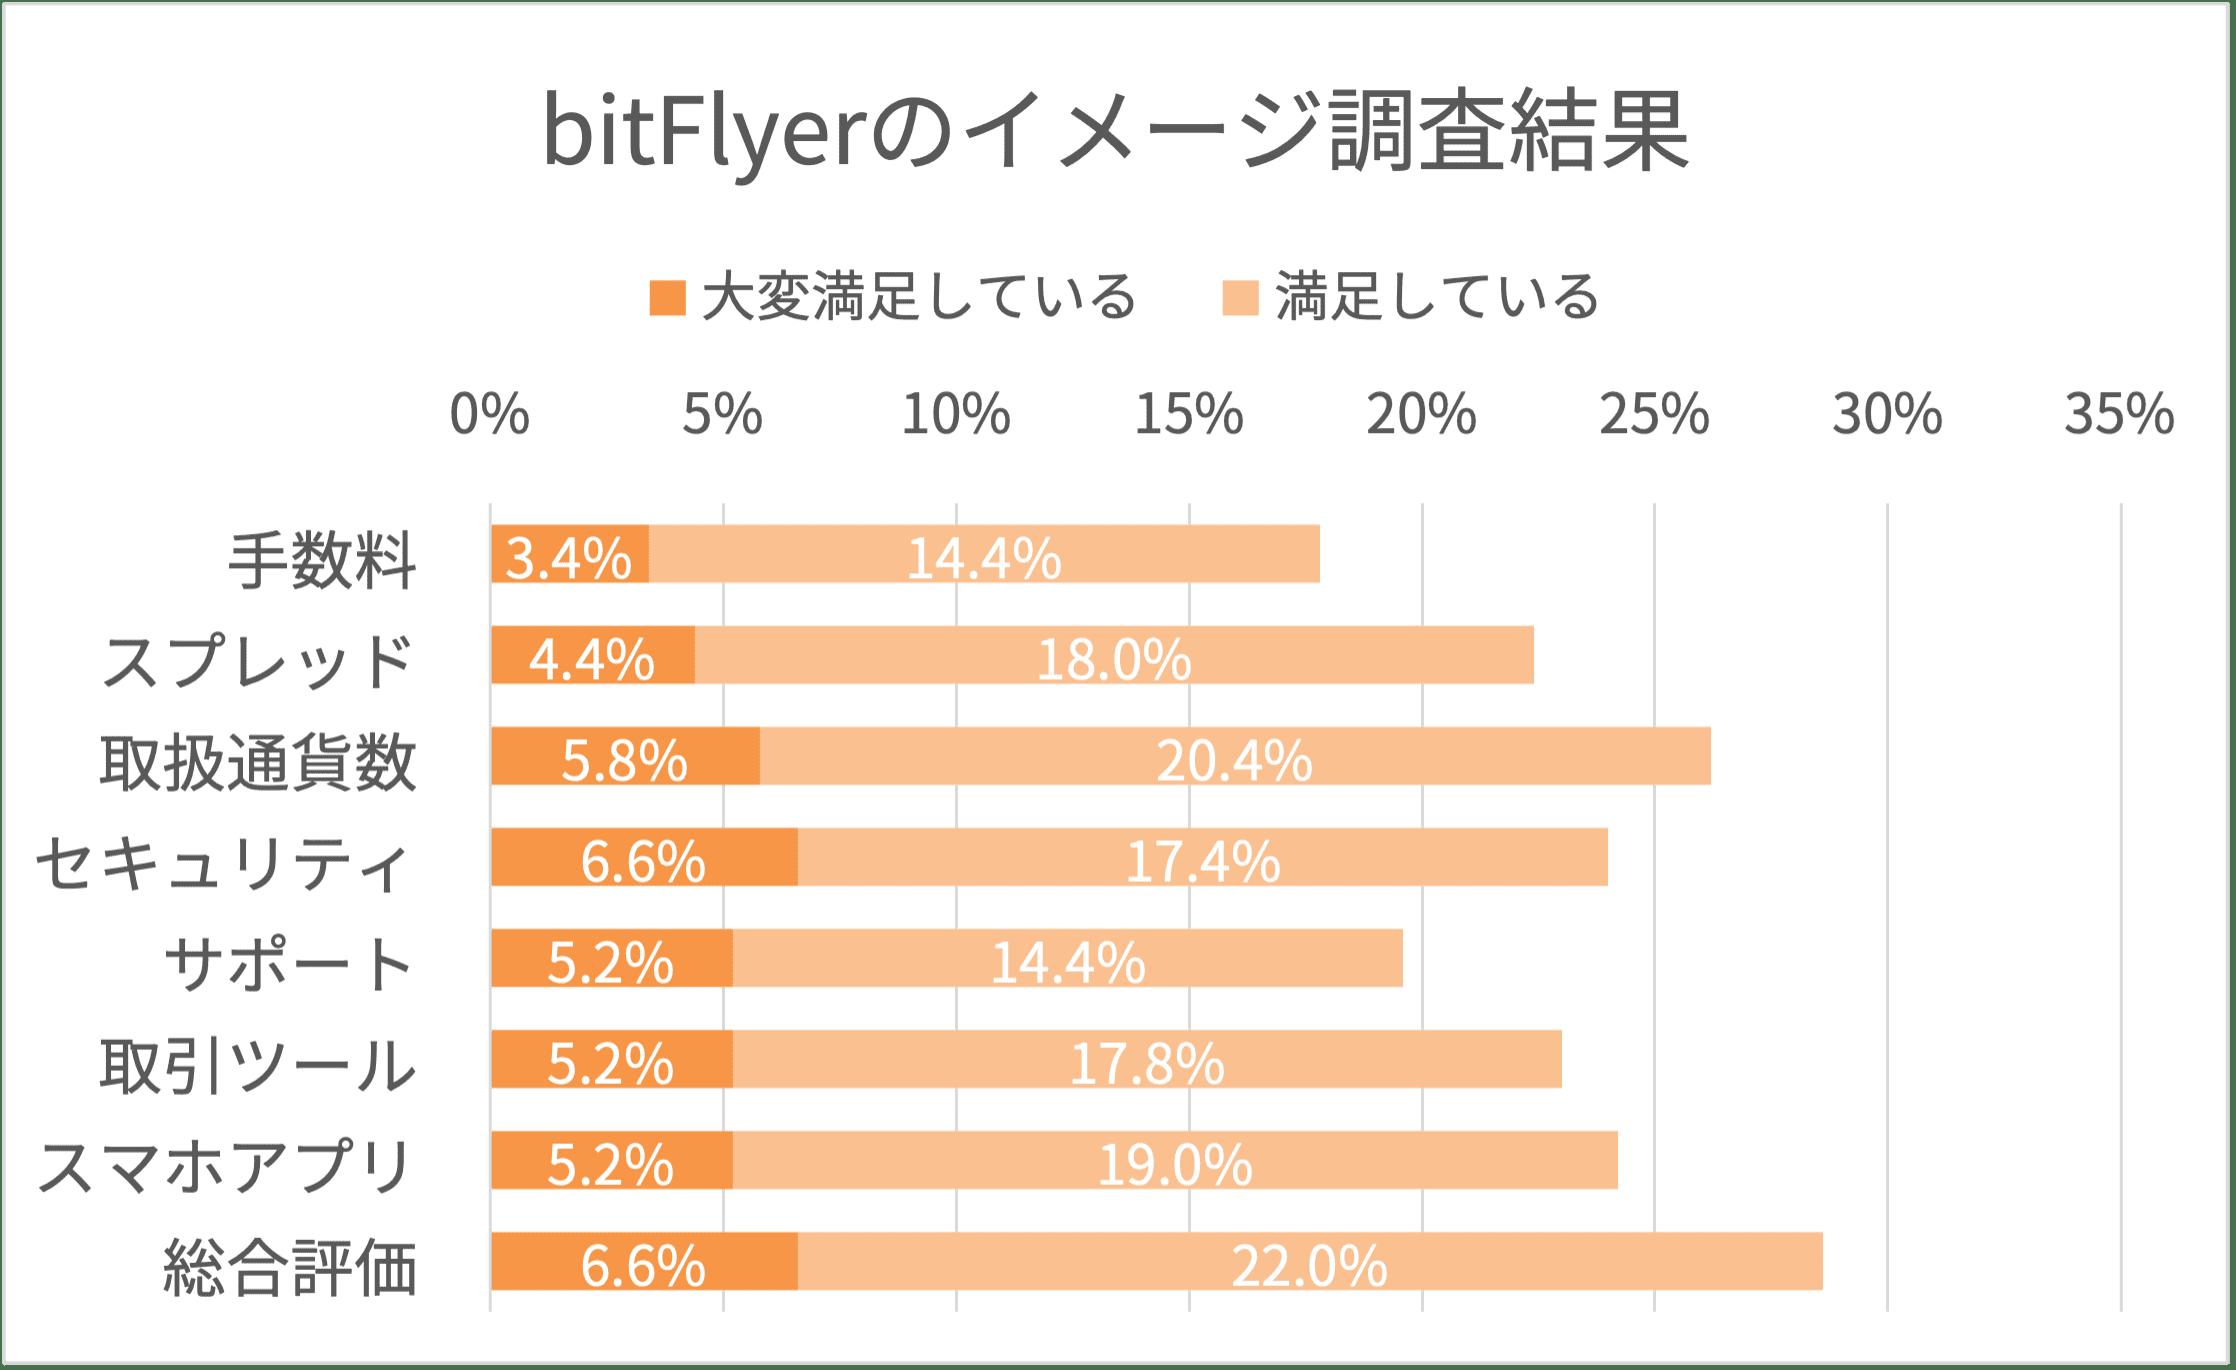 bitflyerのイメージ調査